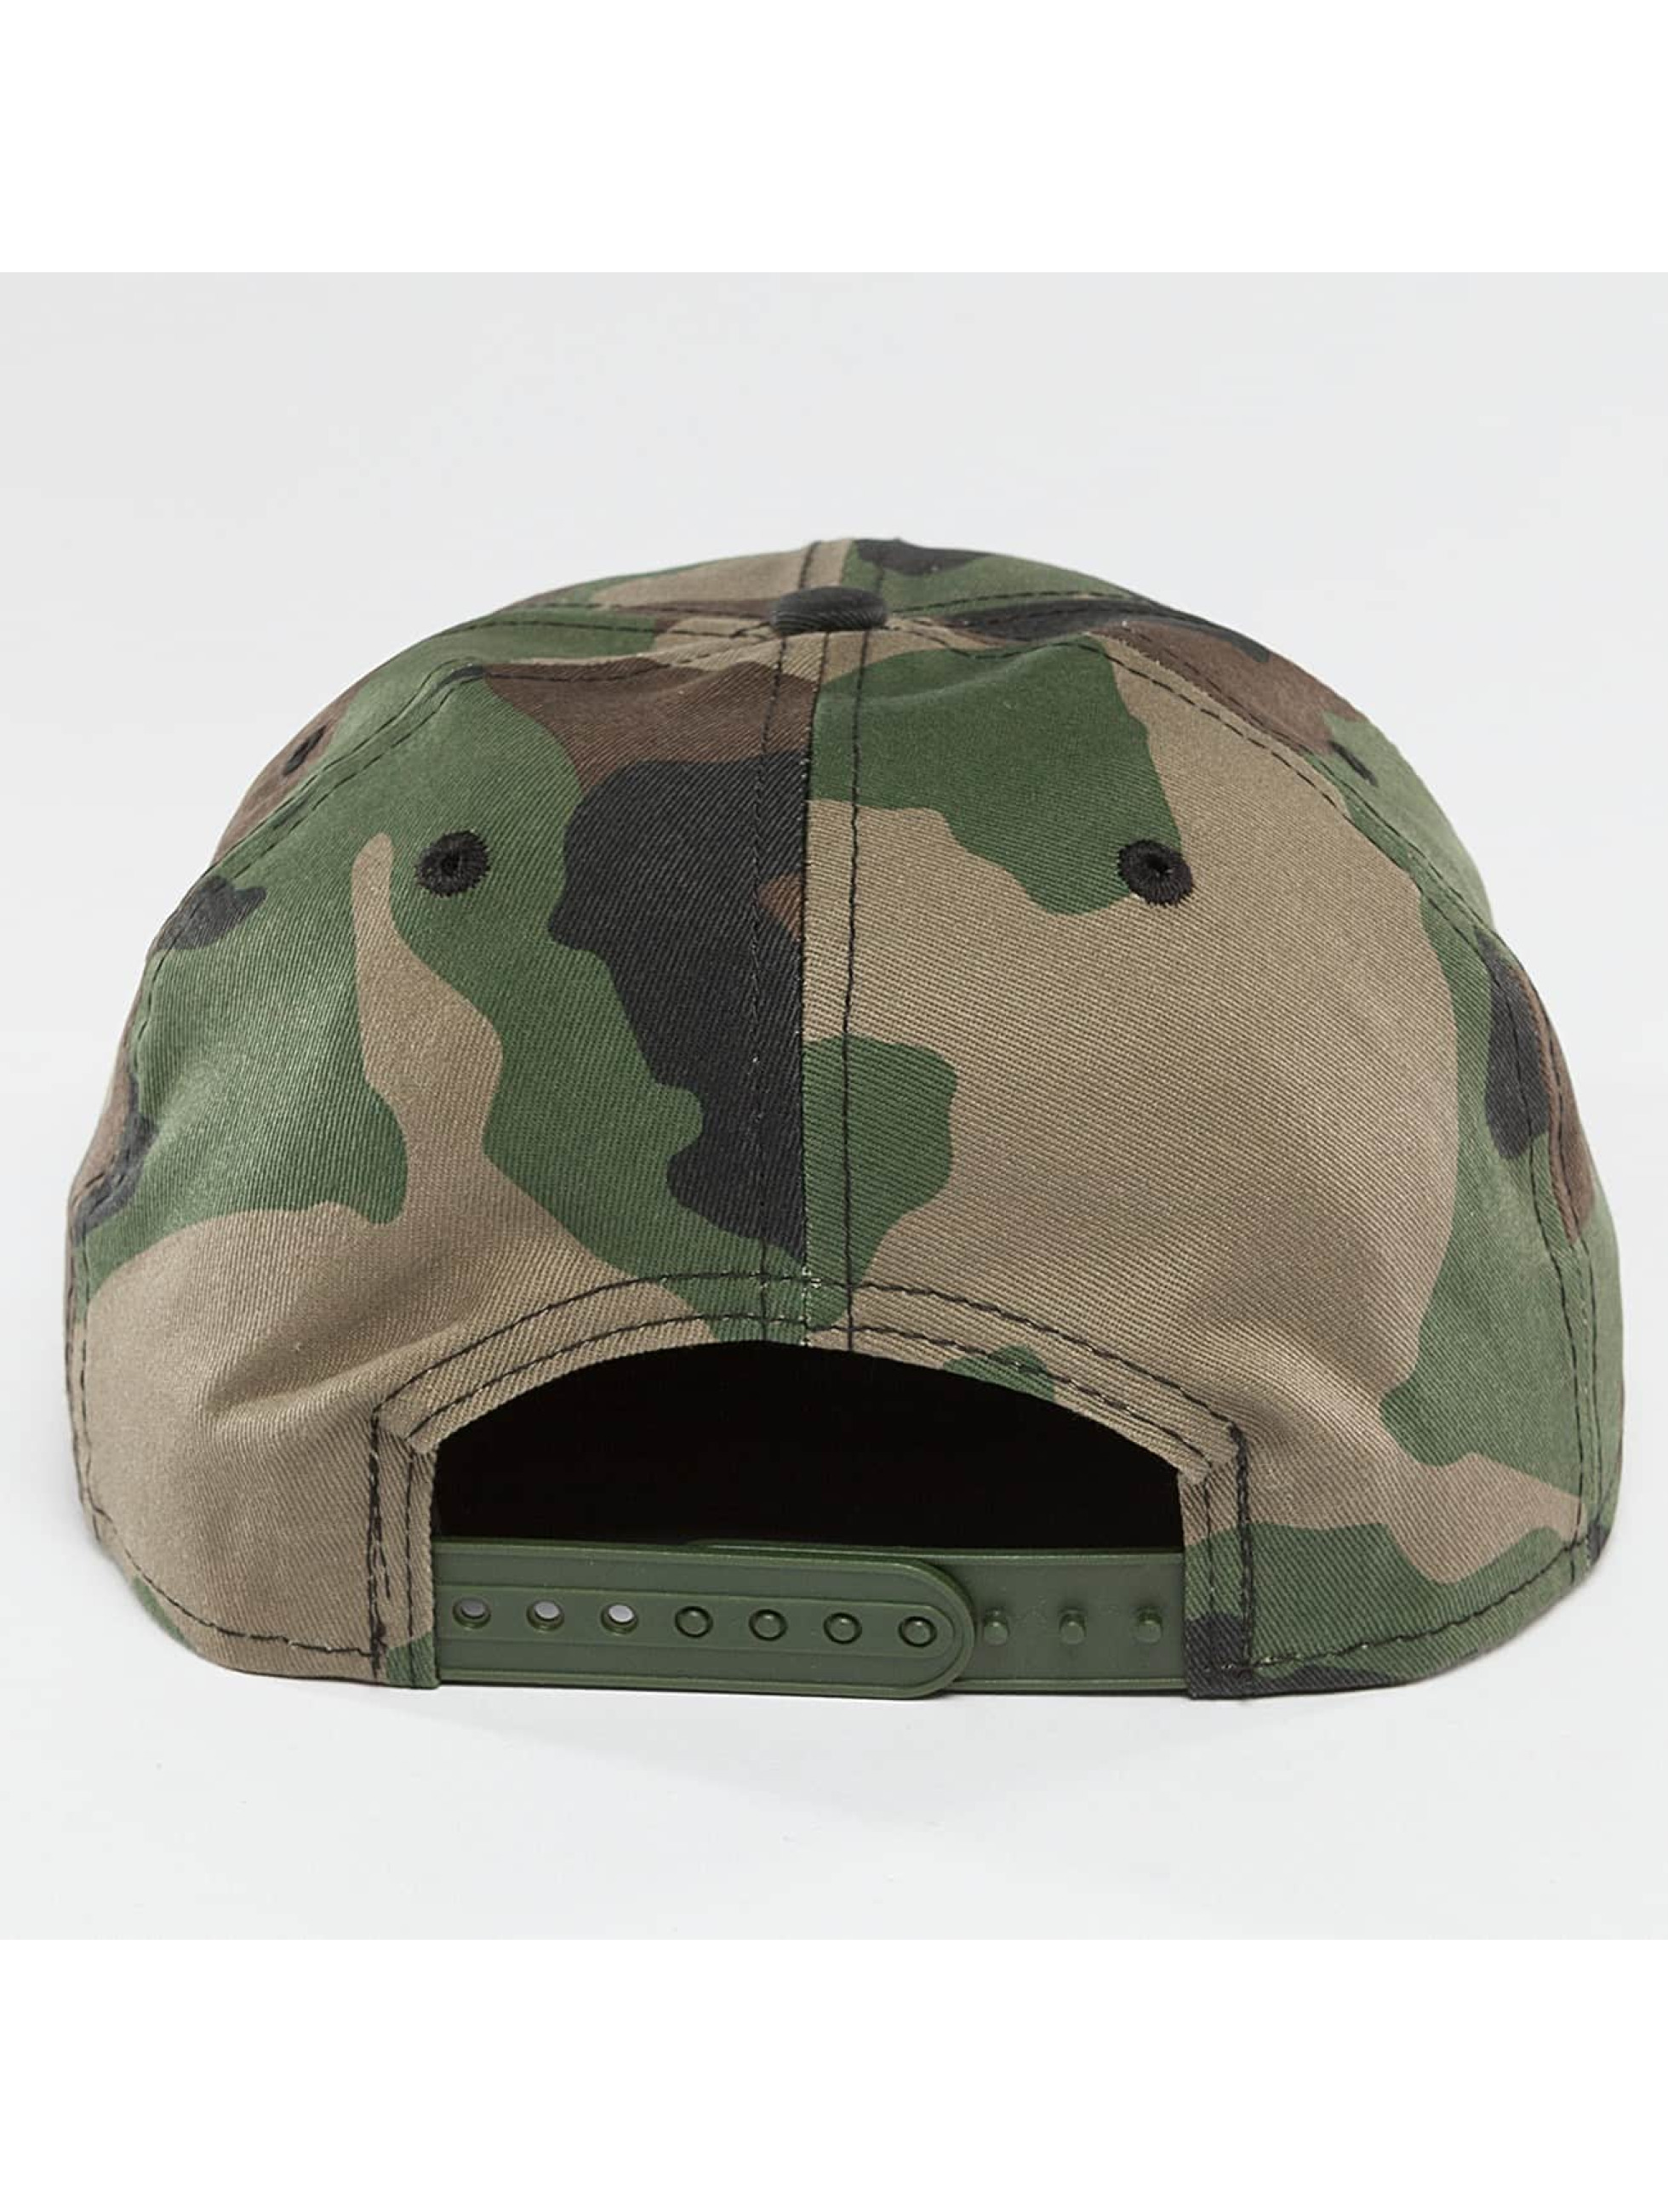 New Era Snapback Cap Flag Contrast camouflage